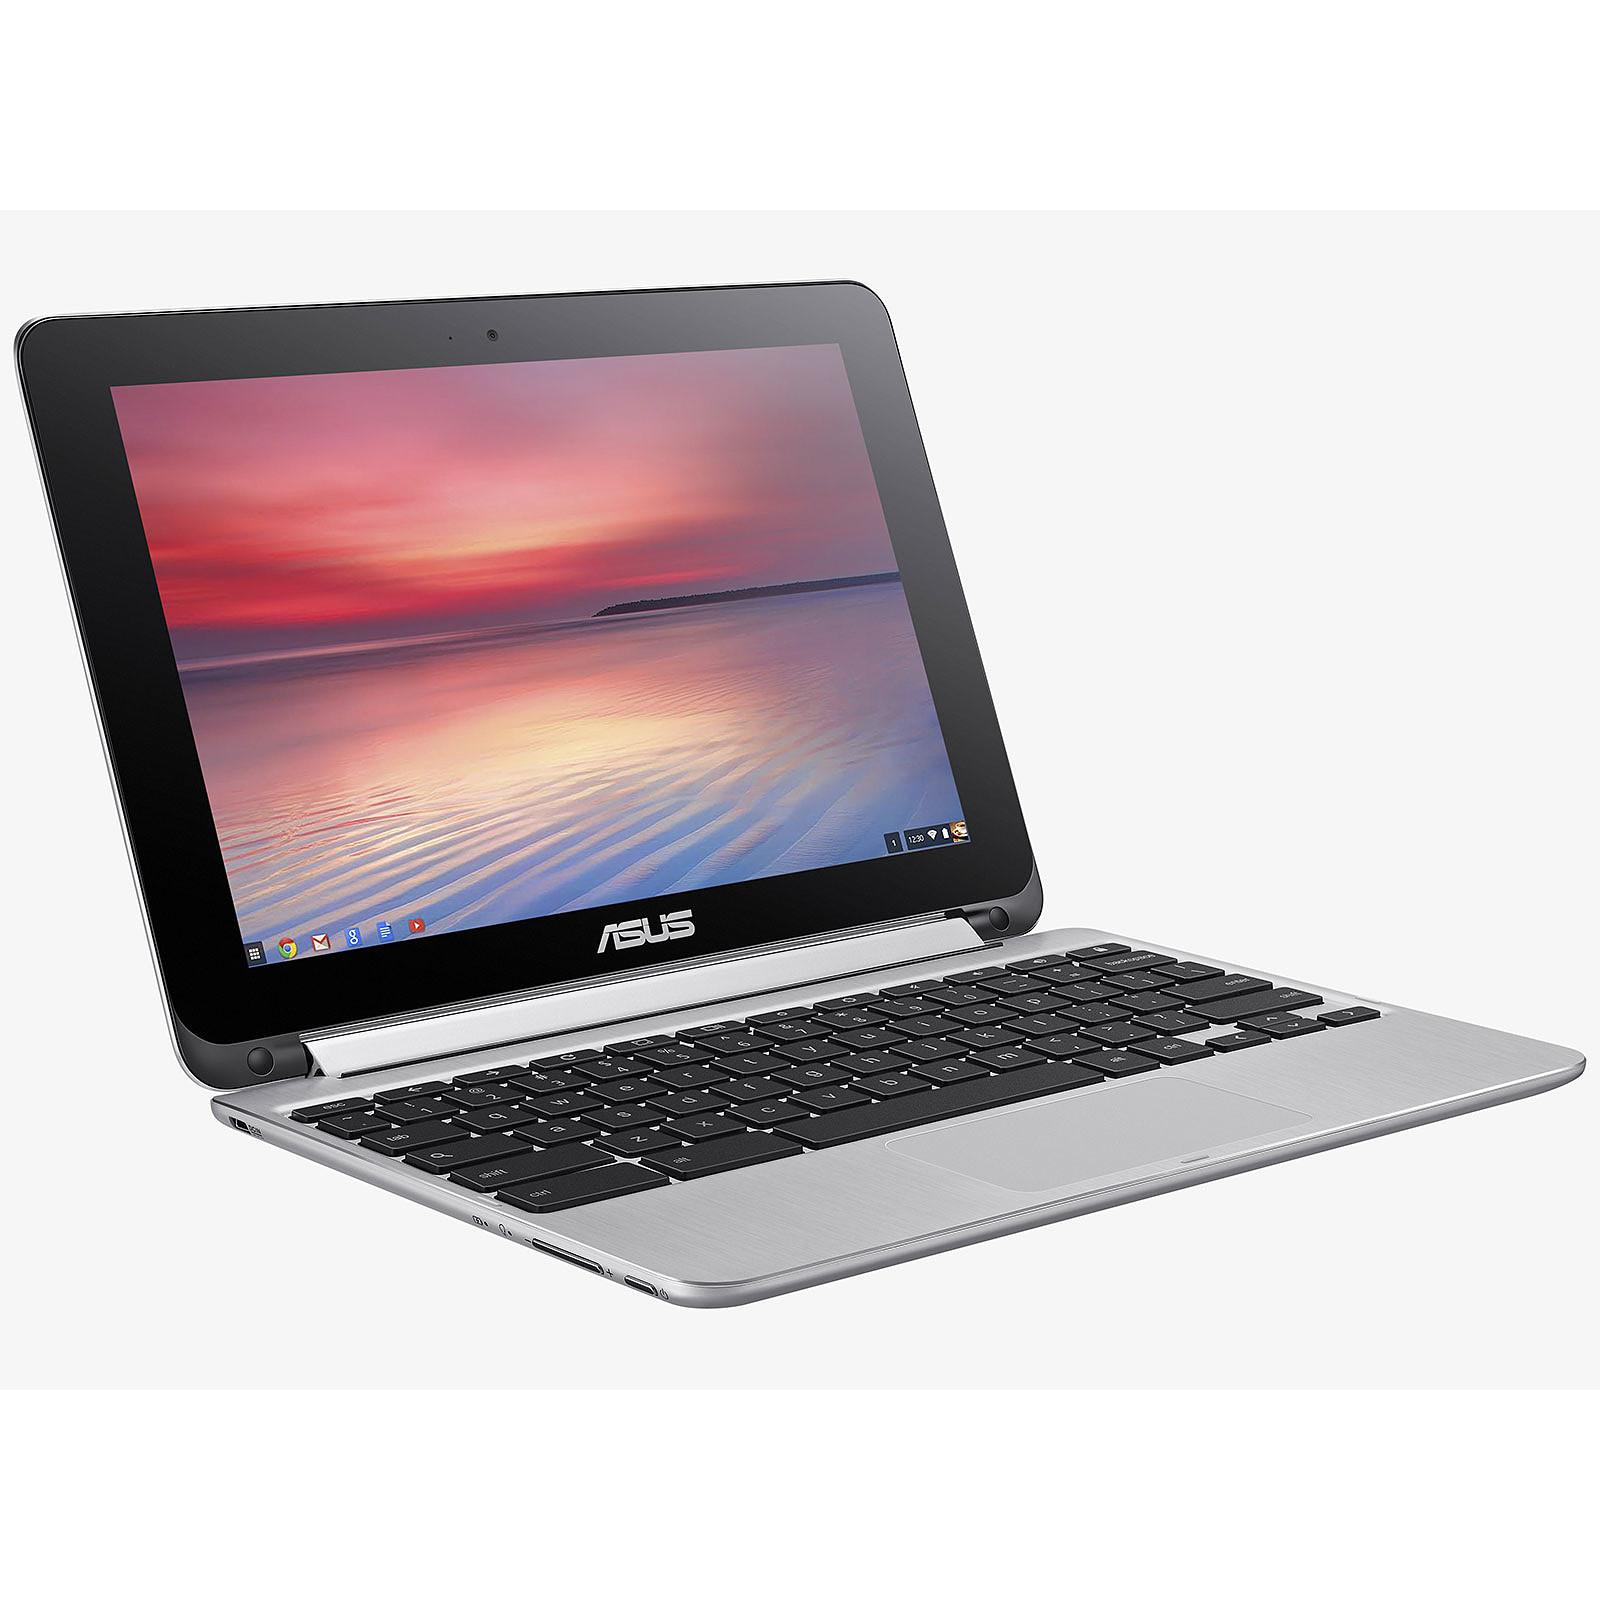 ASUS Chromebook Flip C100PA-FS0020